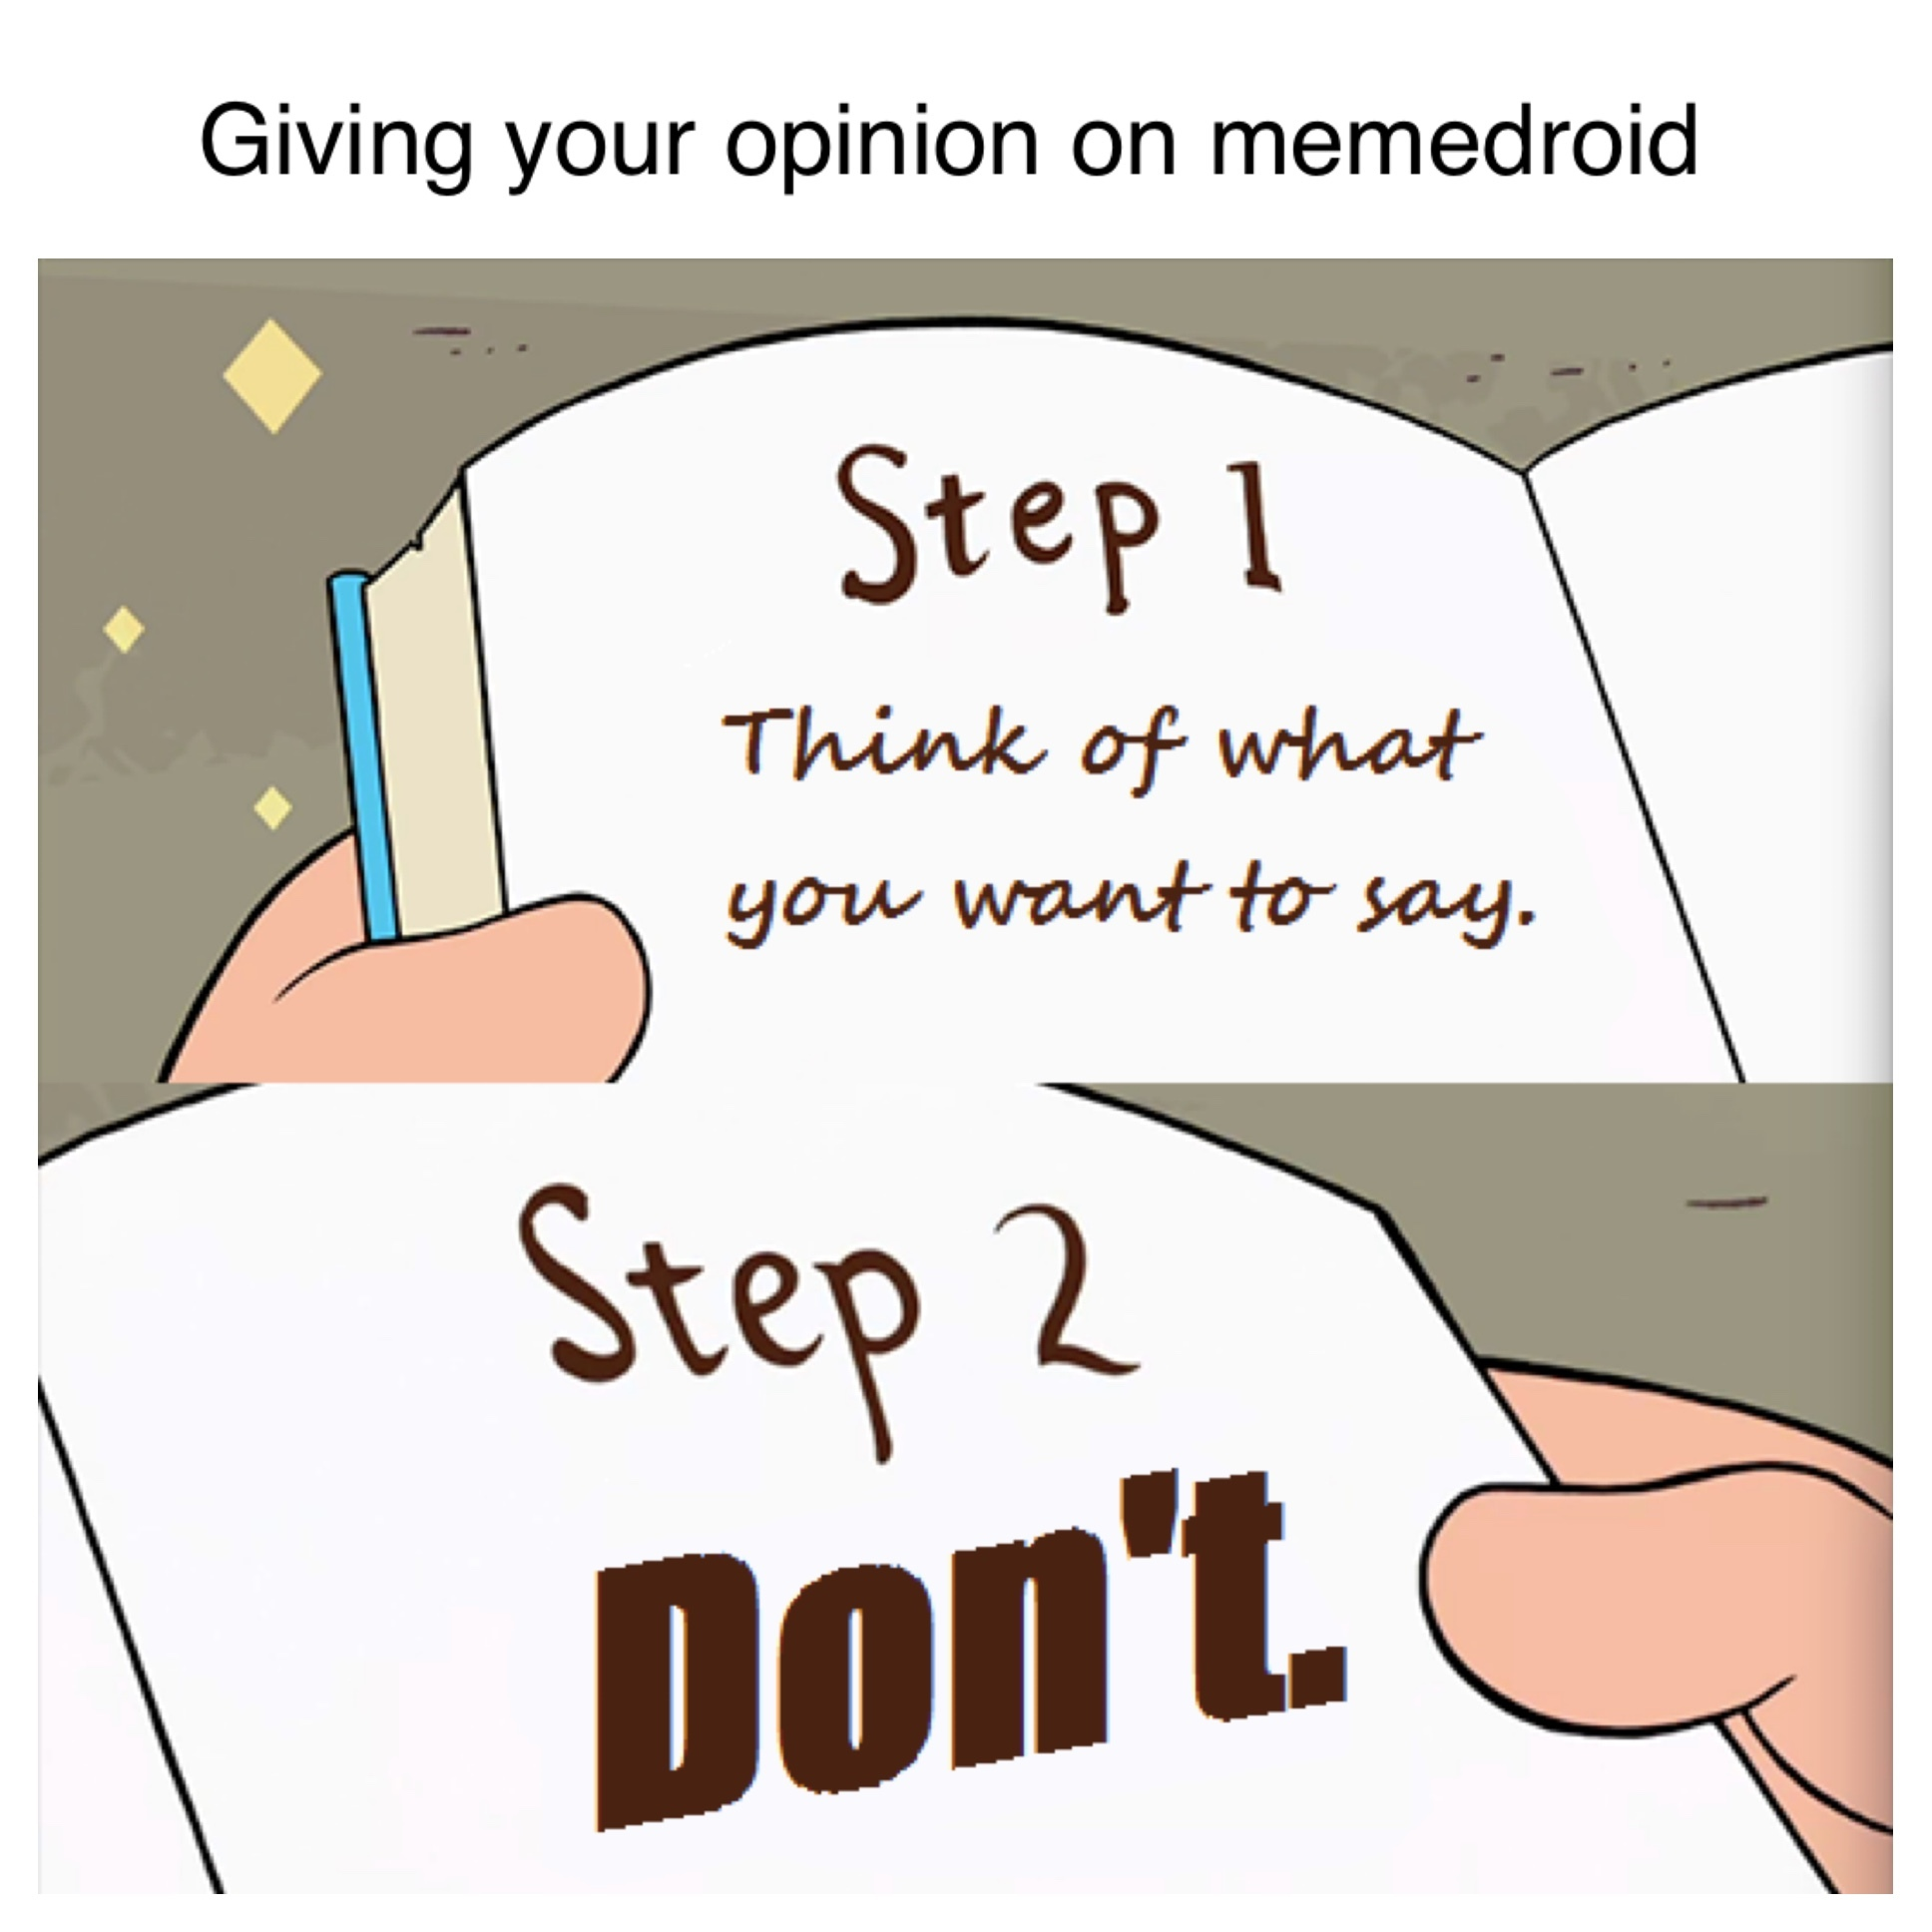 just don't - meme